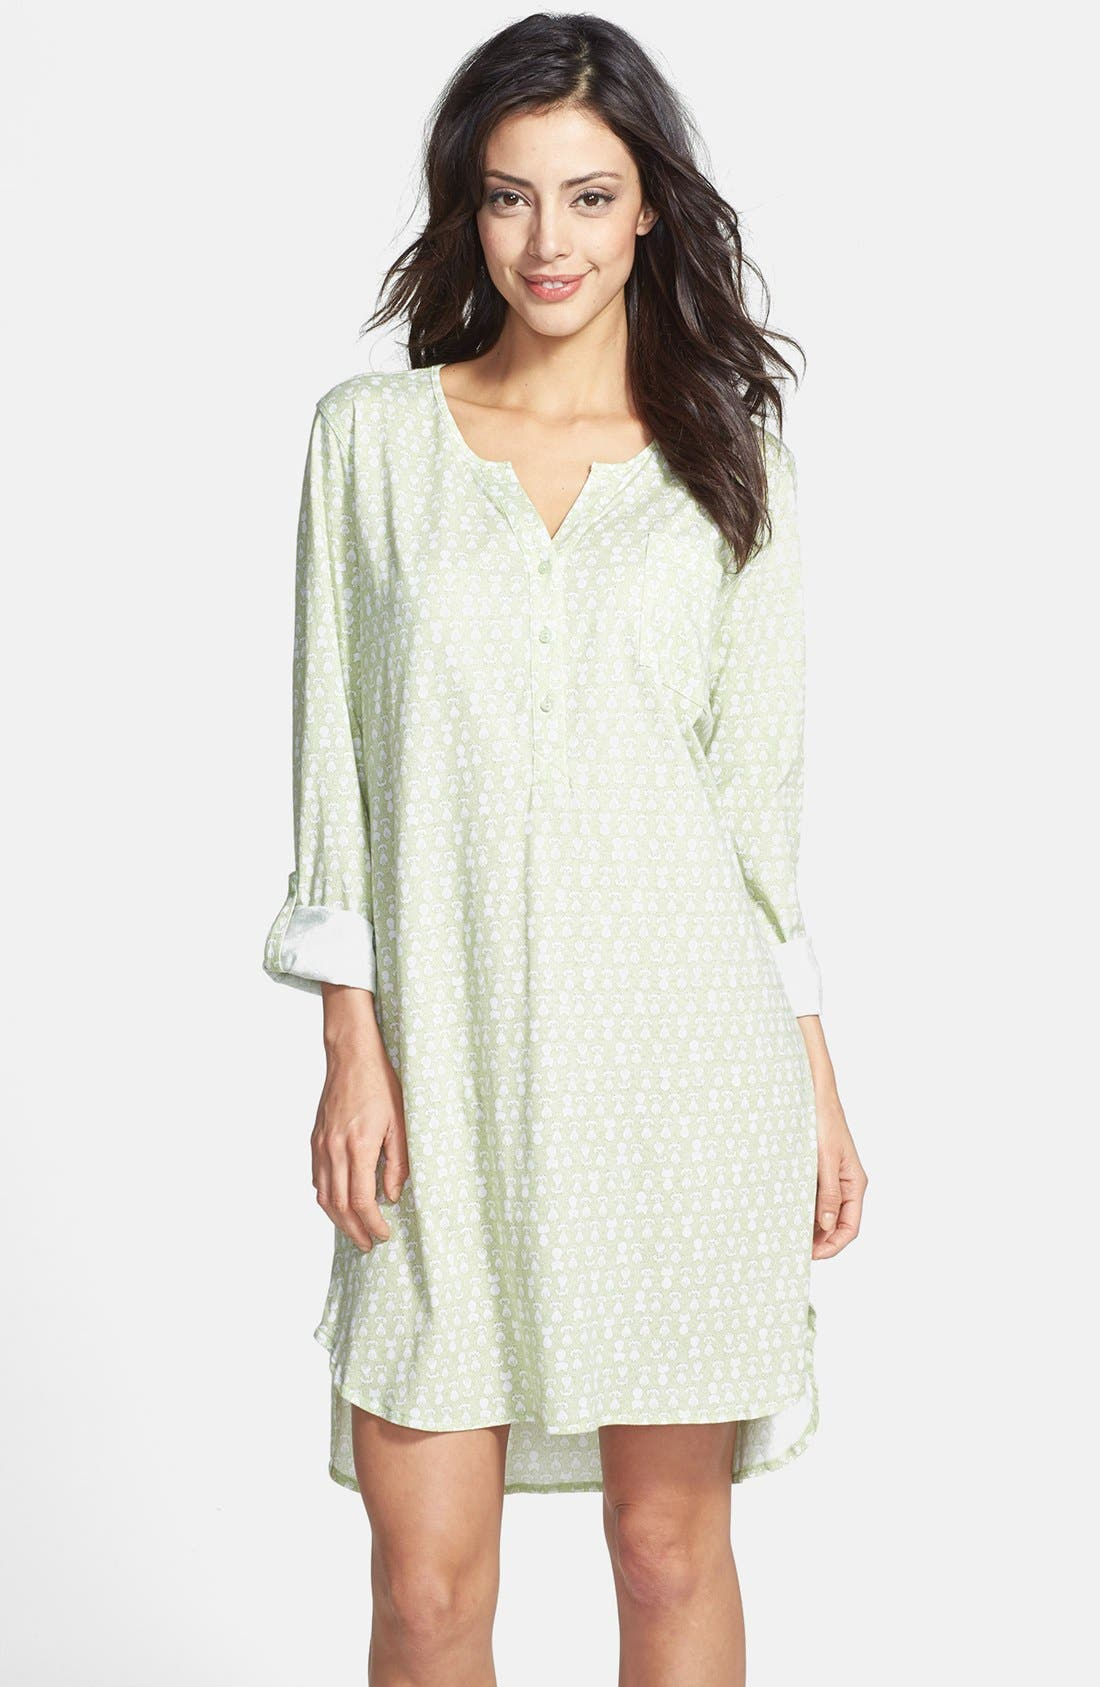 Main Image - Carole Hochman Designs 'Radiant Dots' Sleep Shirt